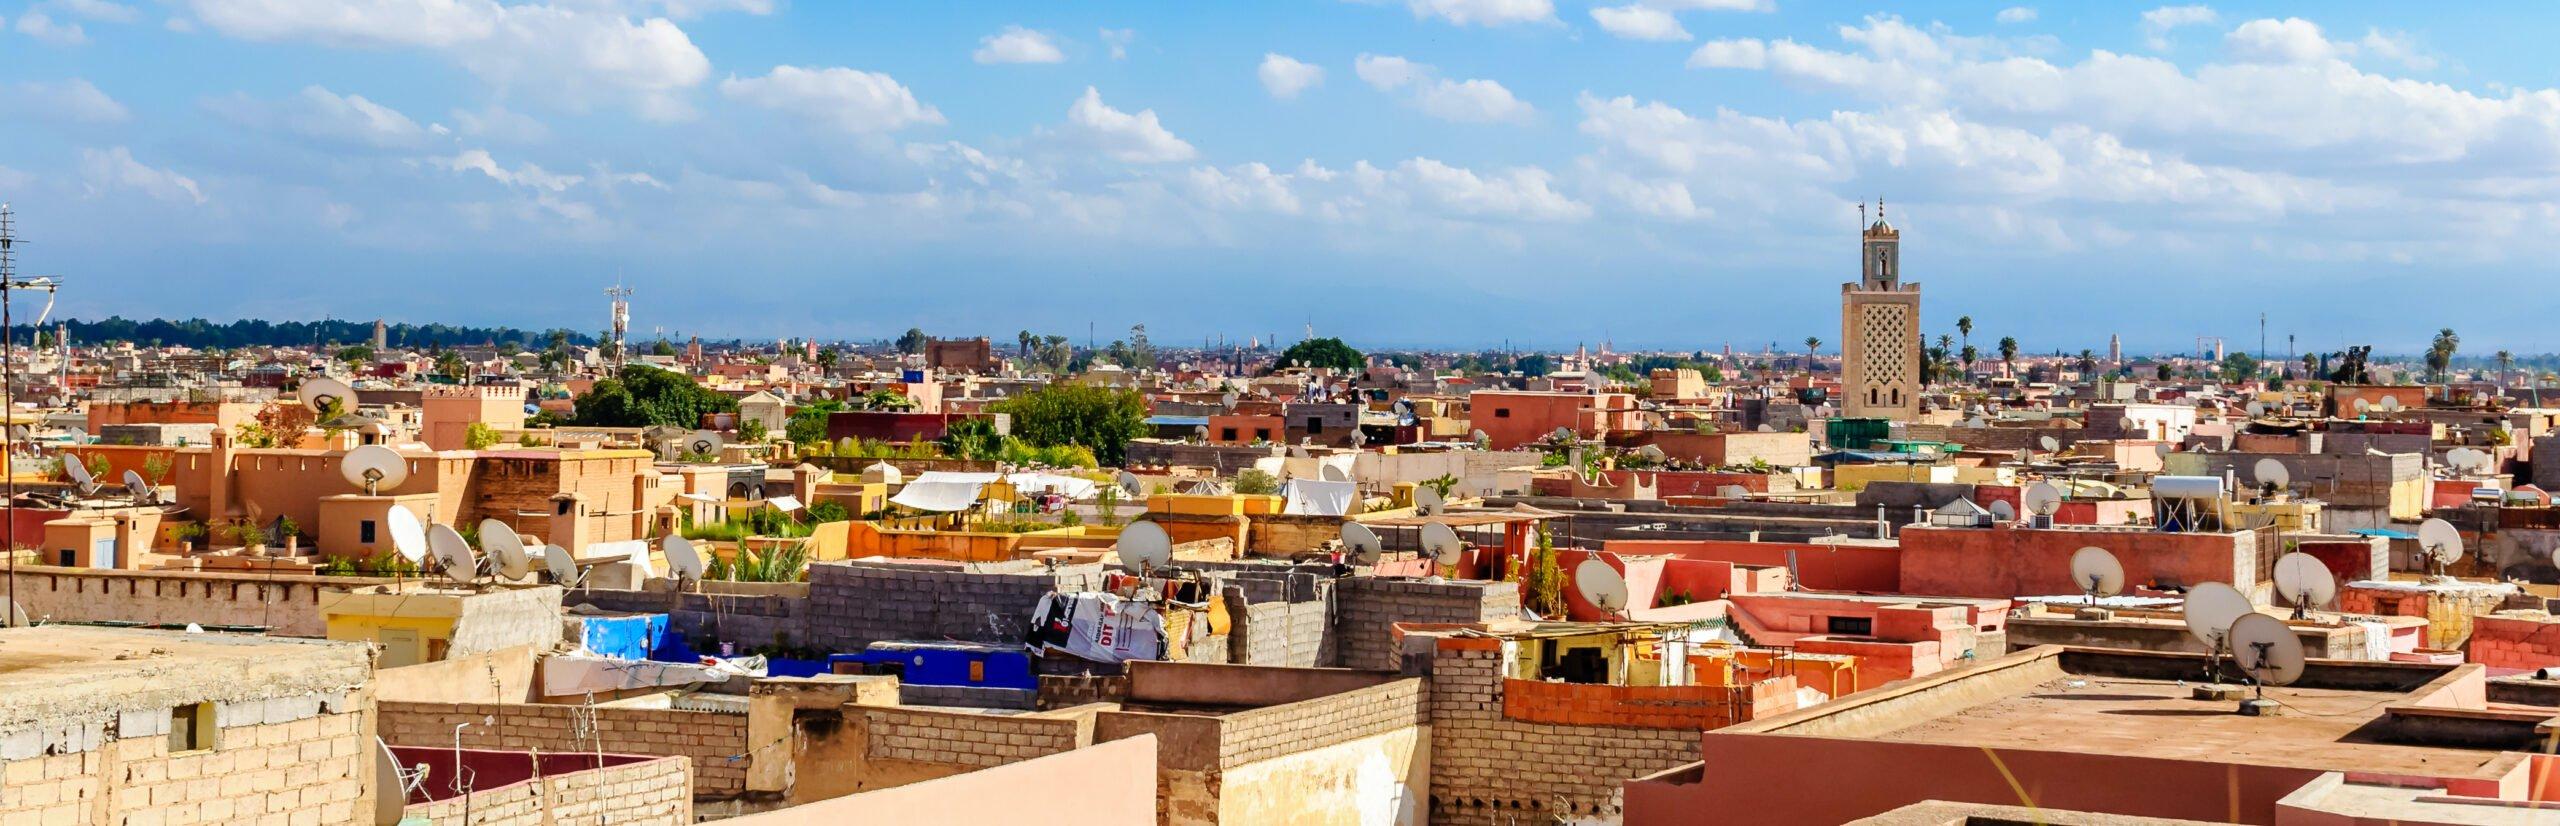 Marrakesh Travel Guide